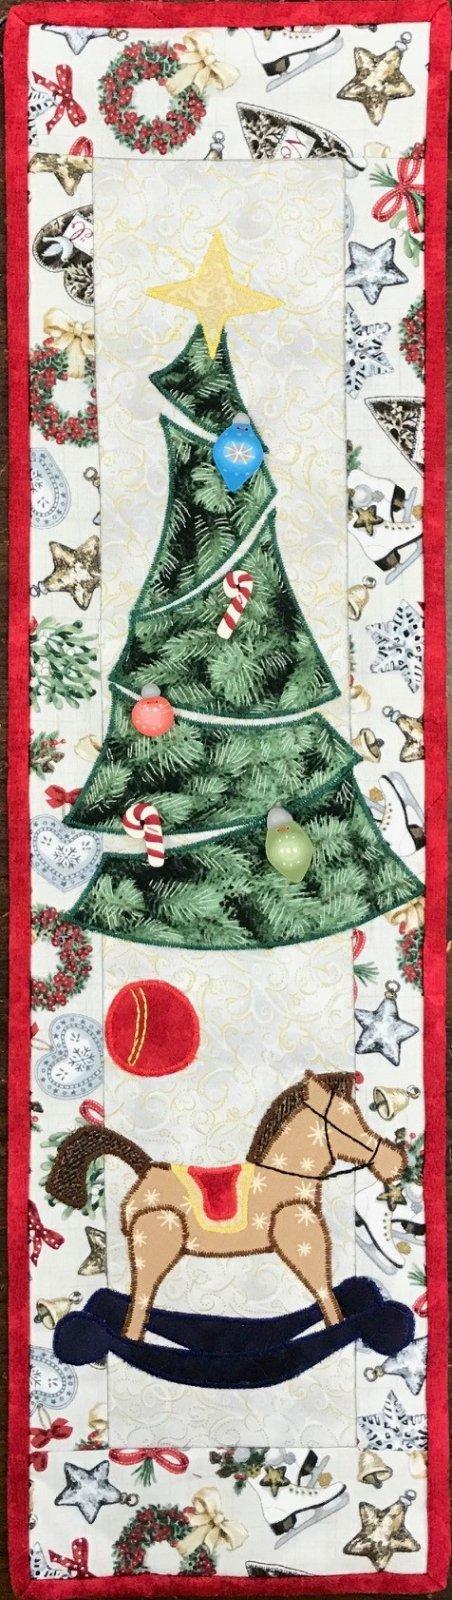 MM#11 December Christmas Morning